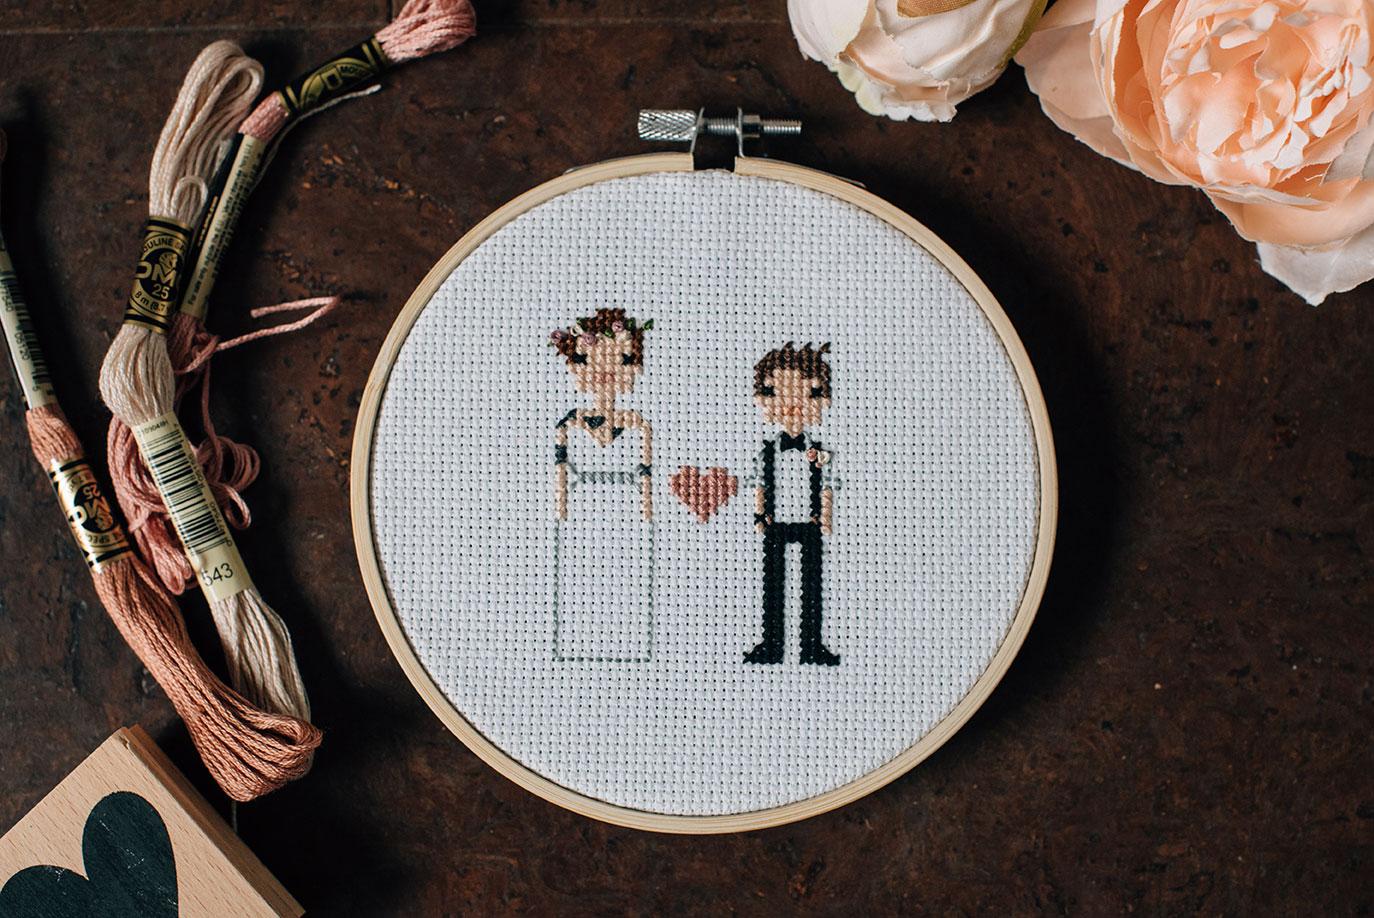 Custom cross-stitch of a same-sex LGBTQ couple by Sara Wilde